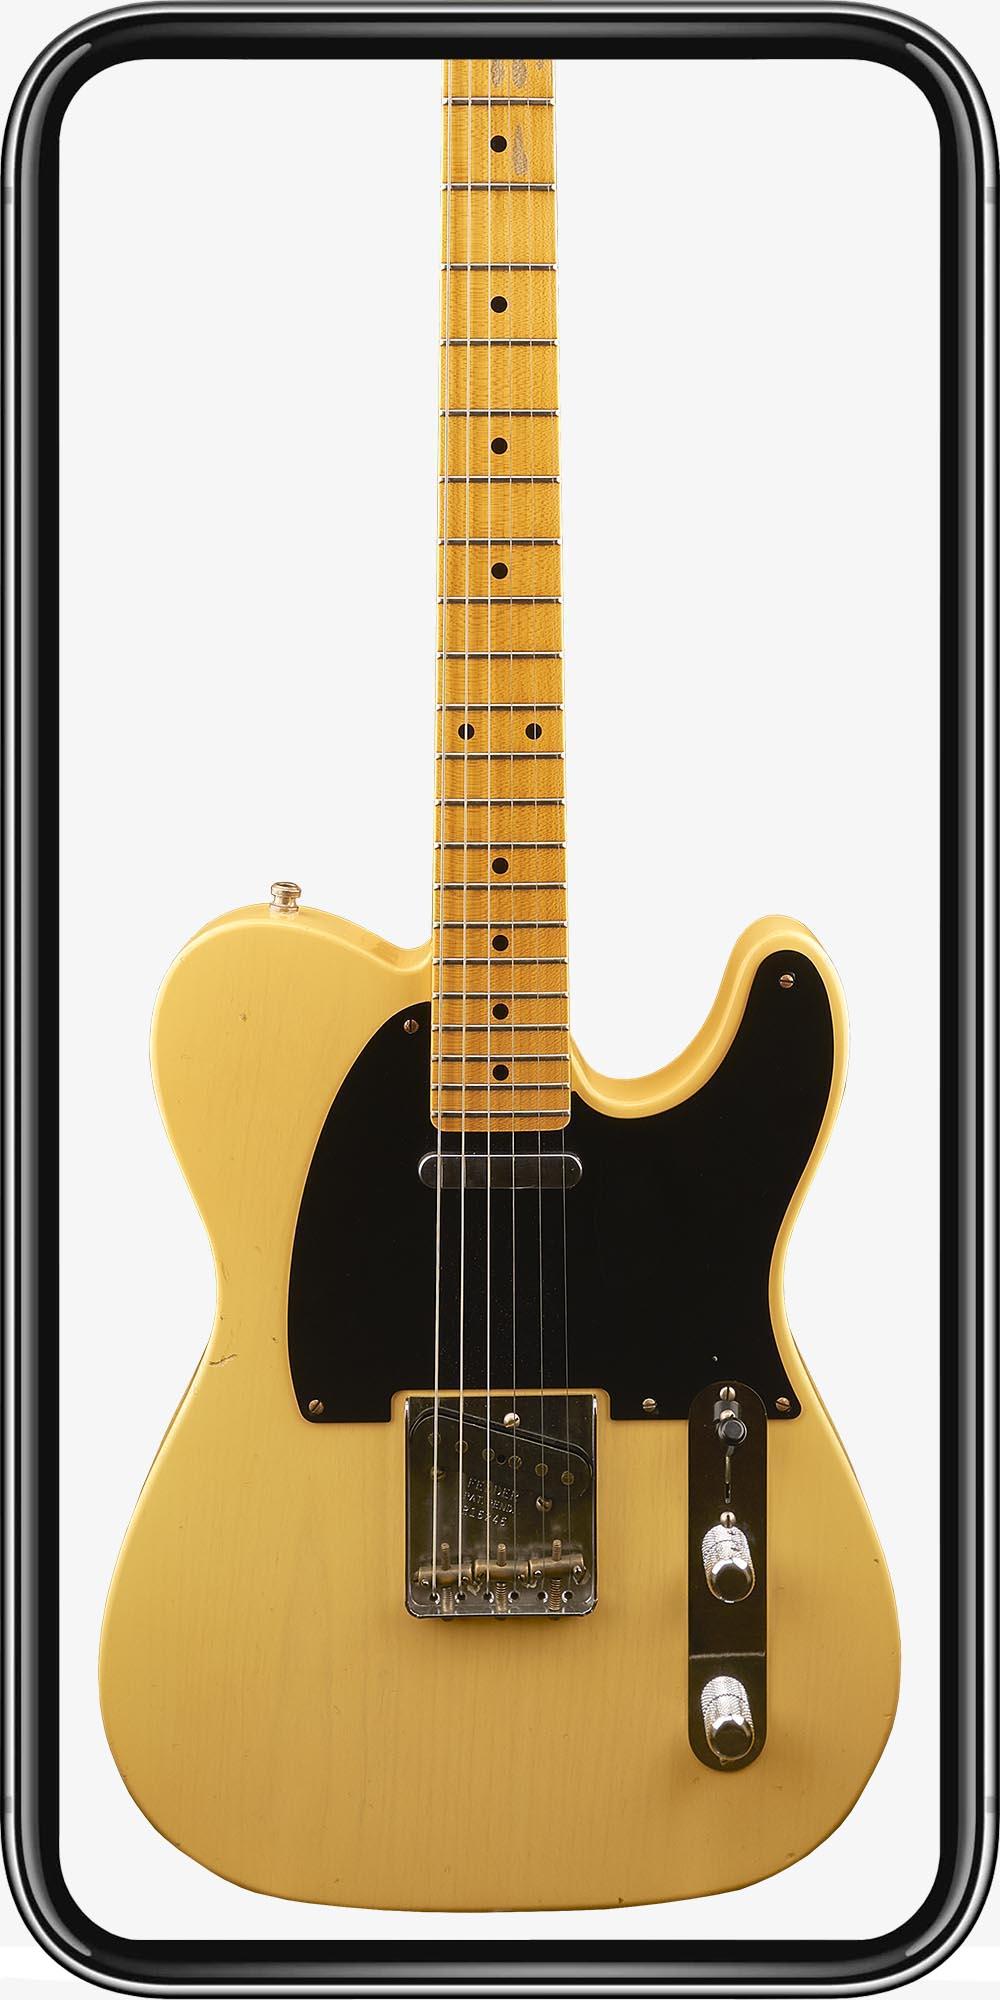 Fender Custom Shop Telecaster 52 Ltd.Ed. Mod Journeyman MN Nocaster Blonde